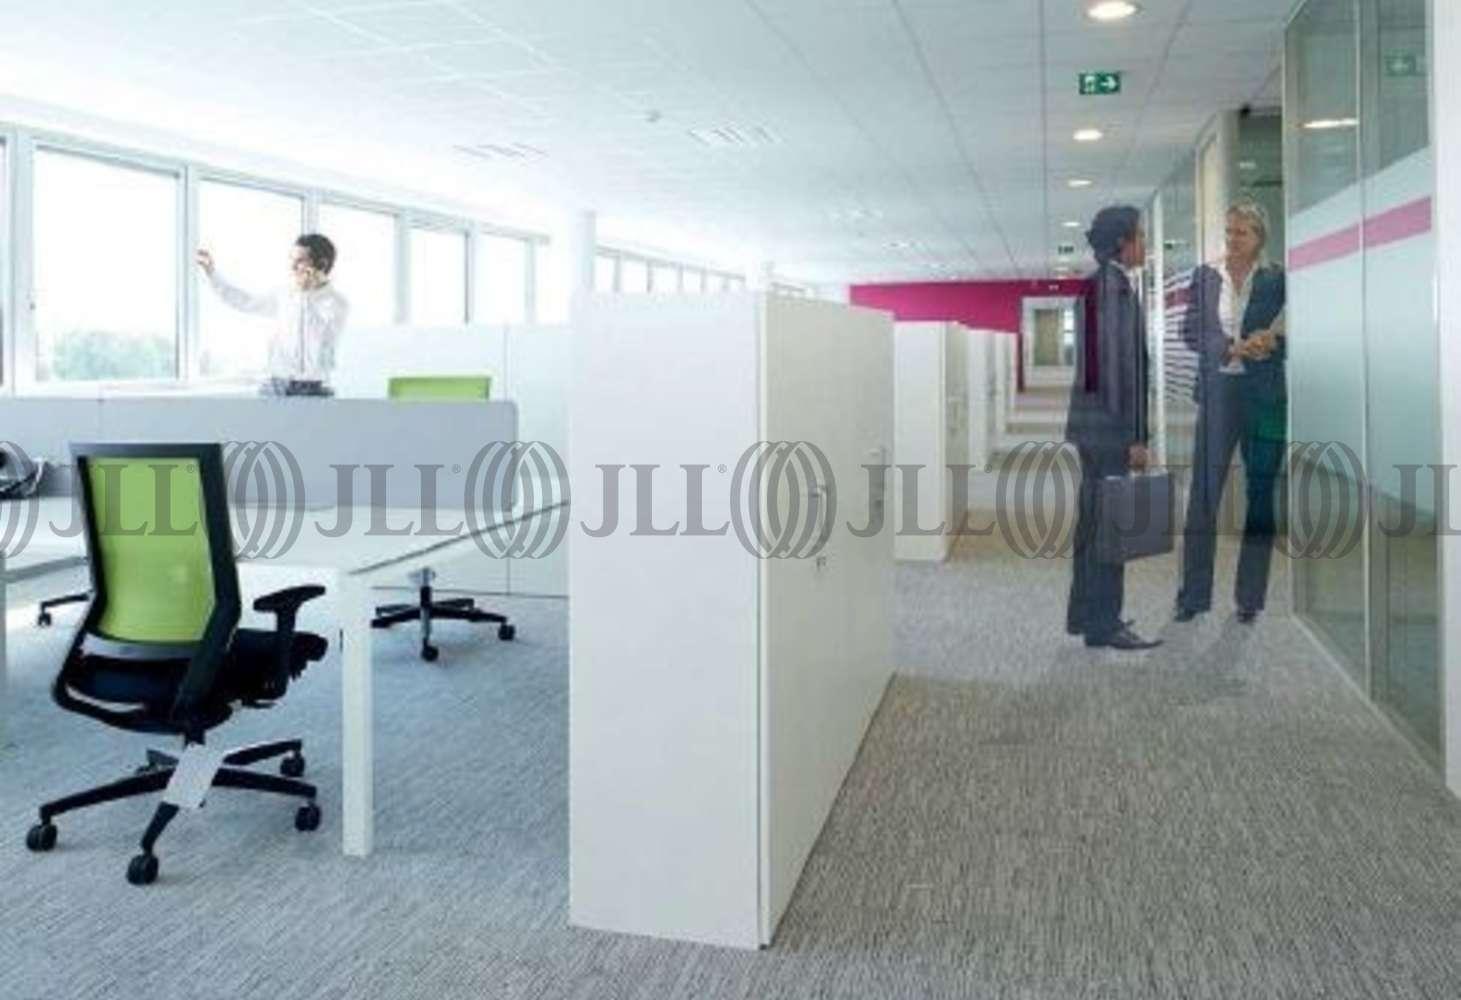 Bureaux Vaulx milieu, 38090 - INNOVA PARK - LOCATION BUREAUX - 9461754